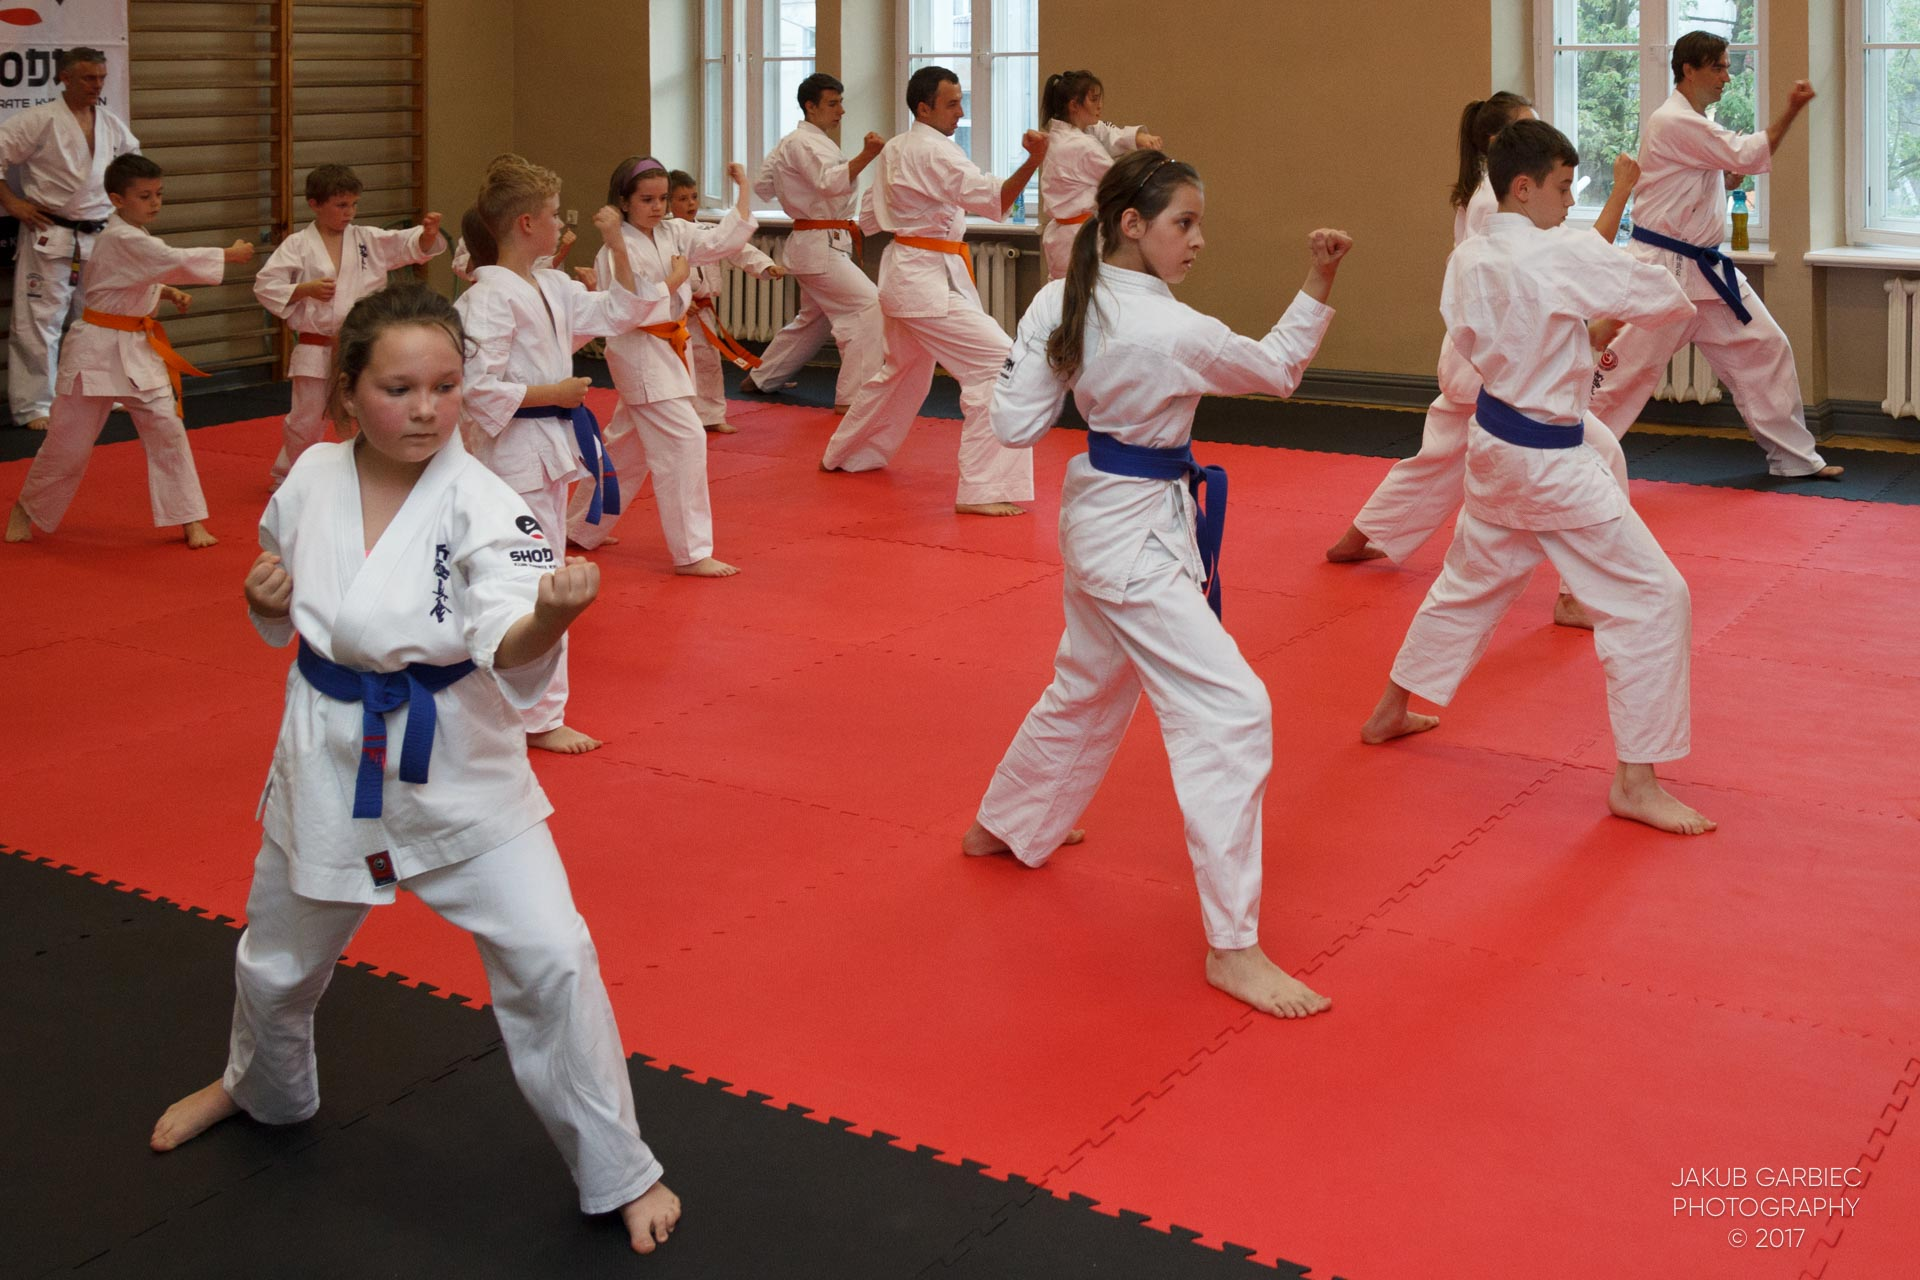 egzamin-karate-mistrz-mariusz-mazur-klub-karate-shodan-2017-06-02-37